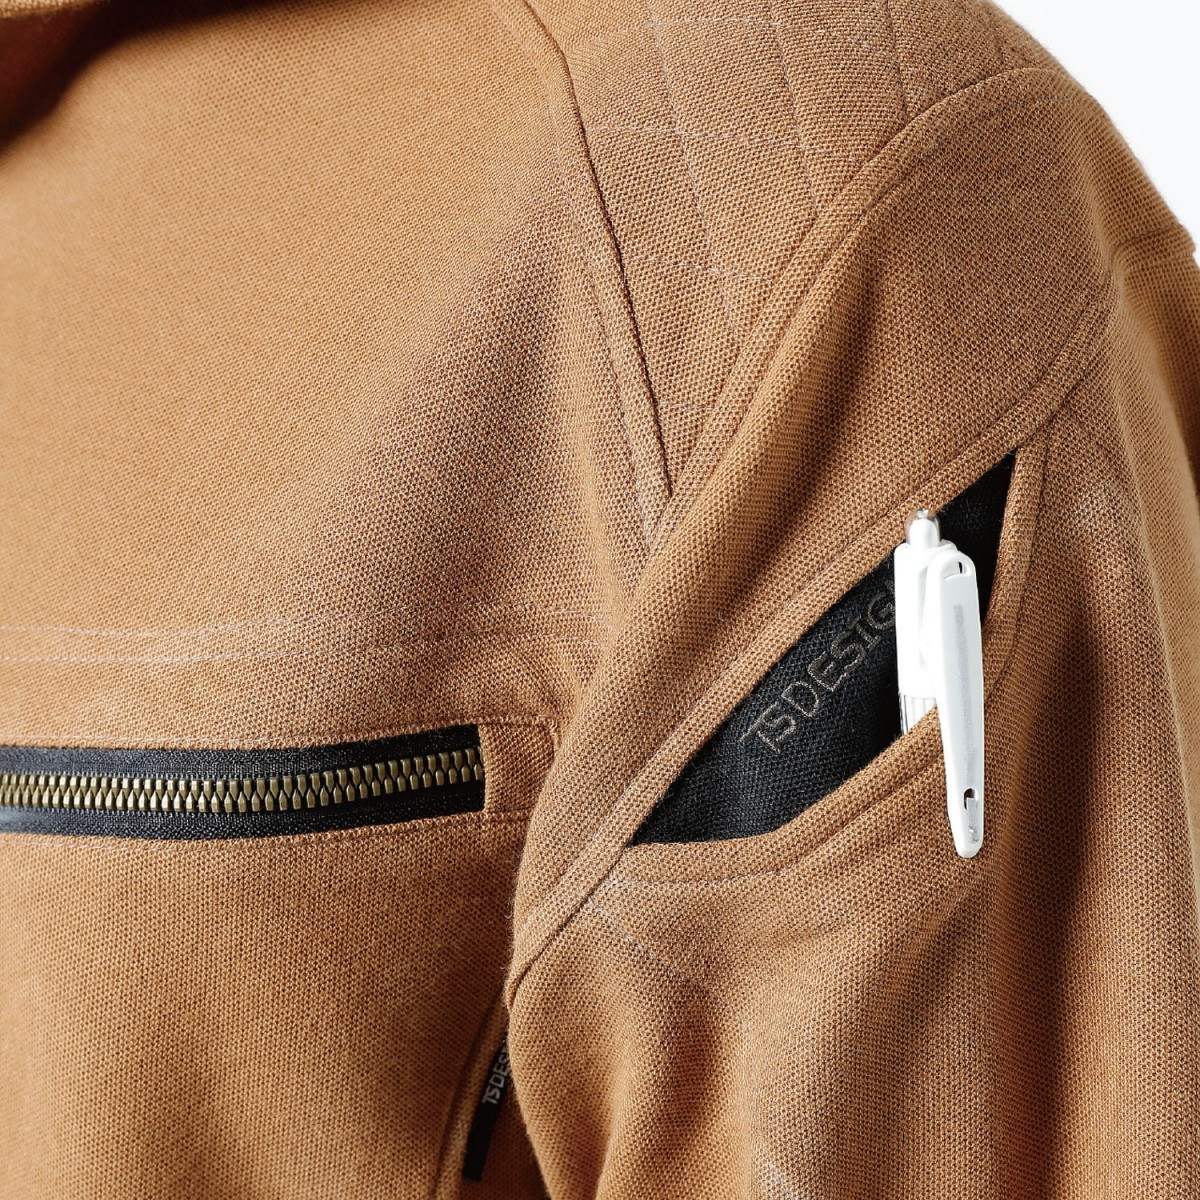 TS DESIGN~TSデザイン~5015 ワークニットロングポロシャツ 左腕マルチポケット。